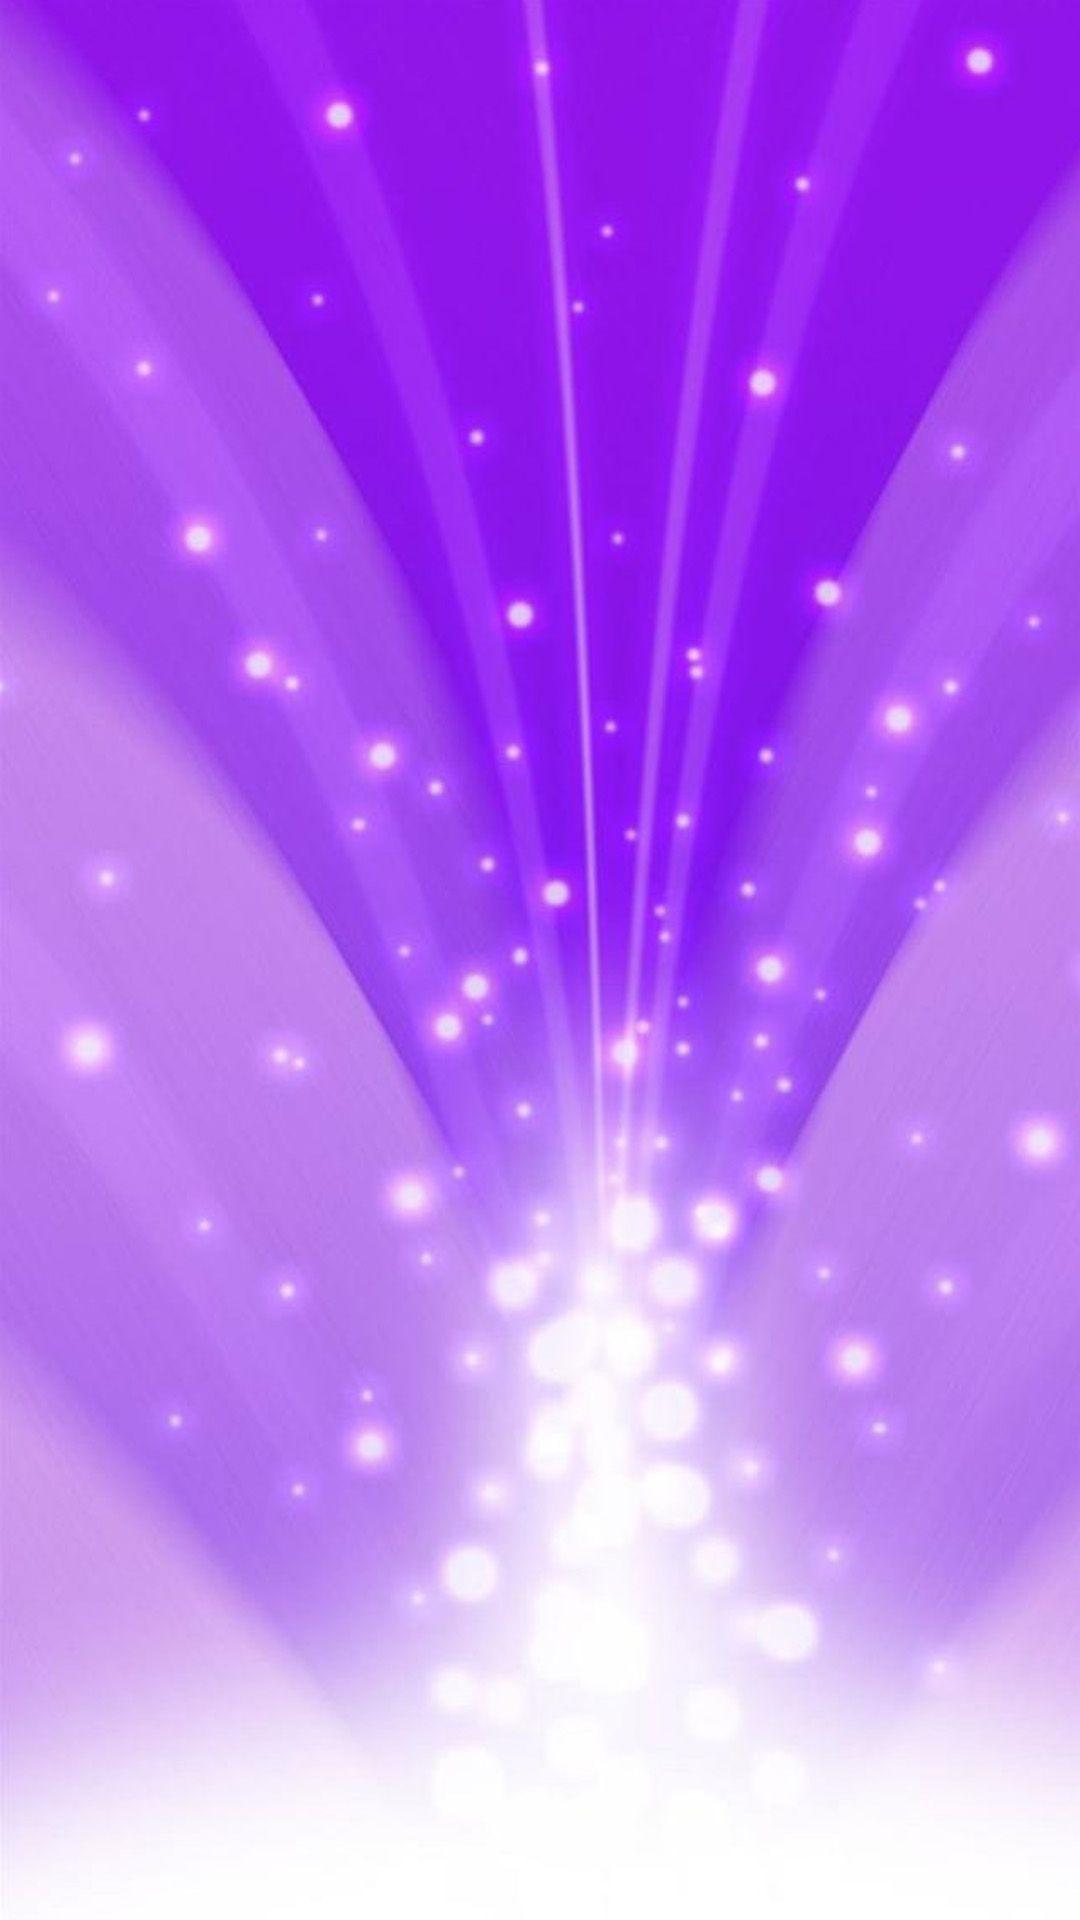 Abstract Flare Purple Light Beam iPhone 6 plus